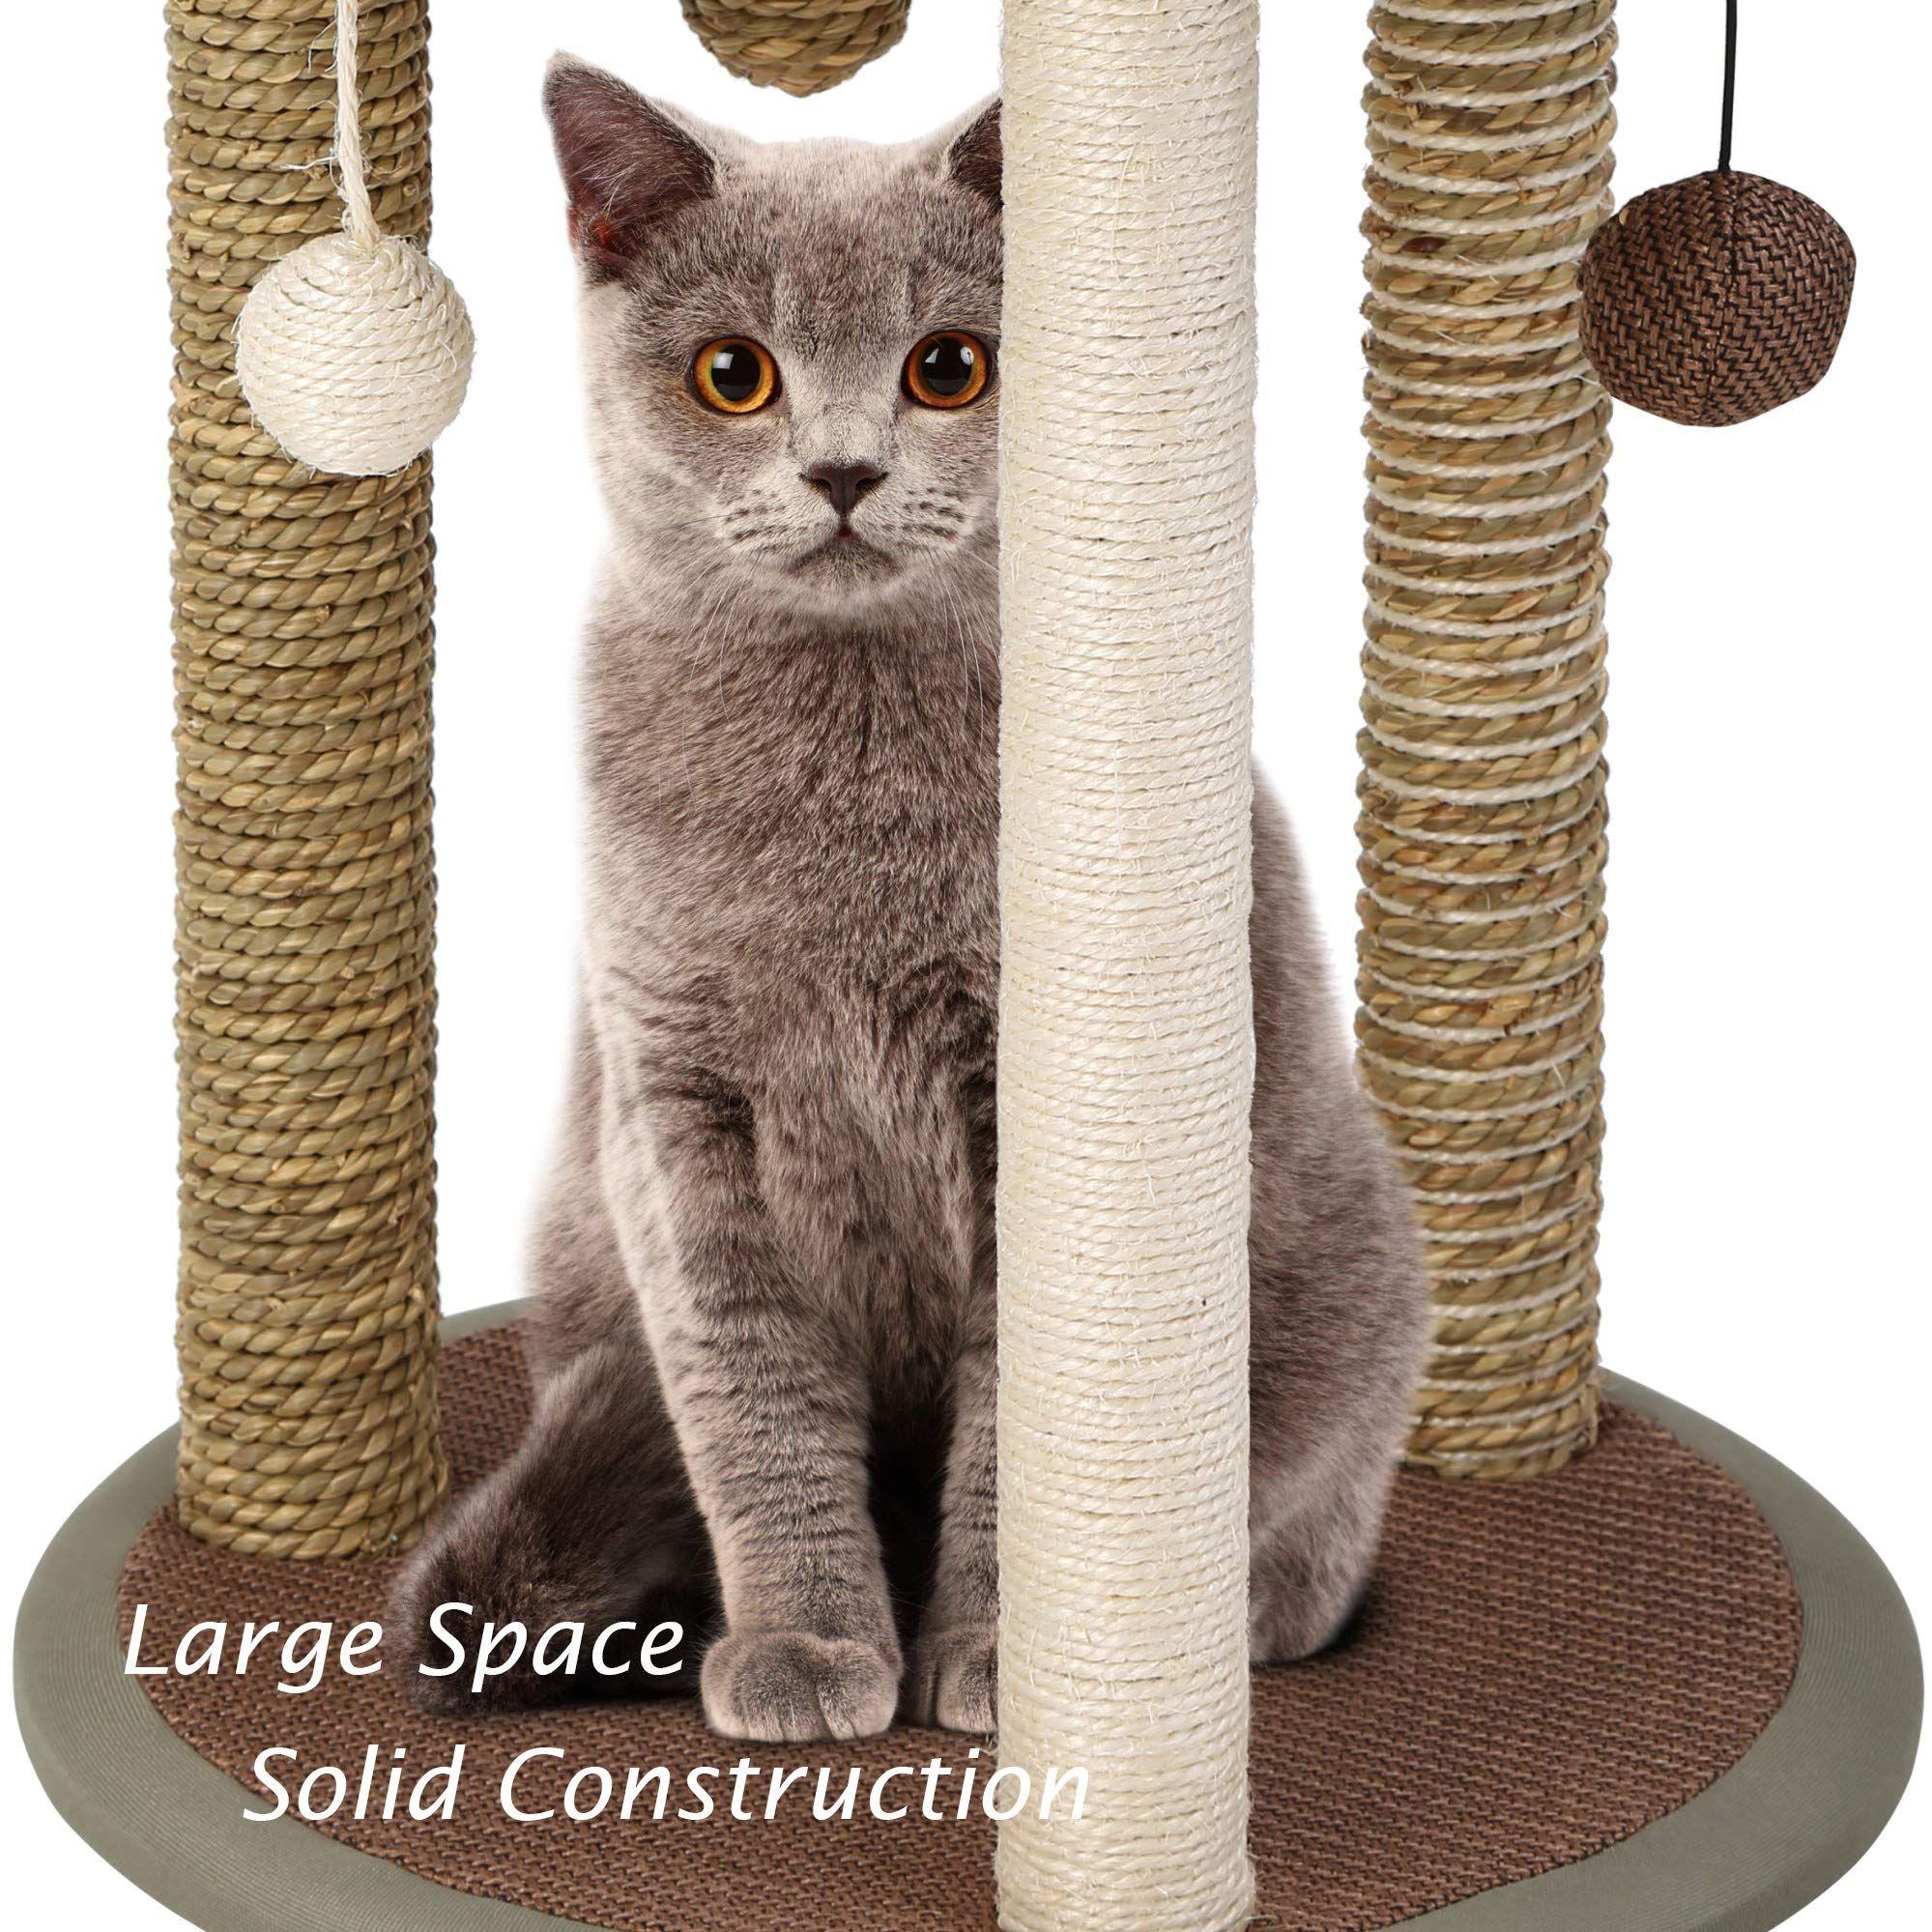 Qaqa Multi Level Cat Tree With Sisal Covered Scratching Posts Multi Platformplush Perches Cat House Tower Furniture Pet Toys Cat Scratcher Cat Scratching Post